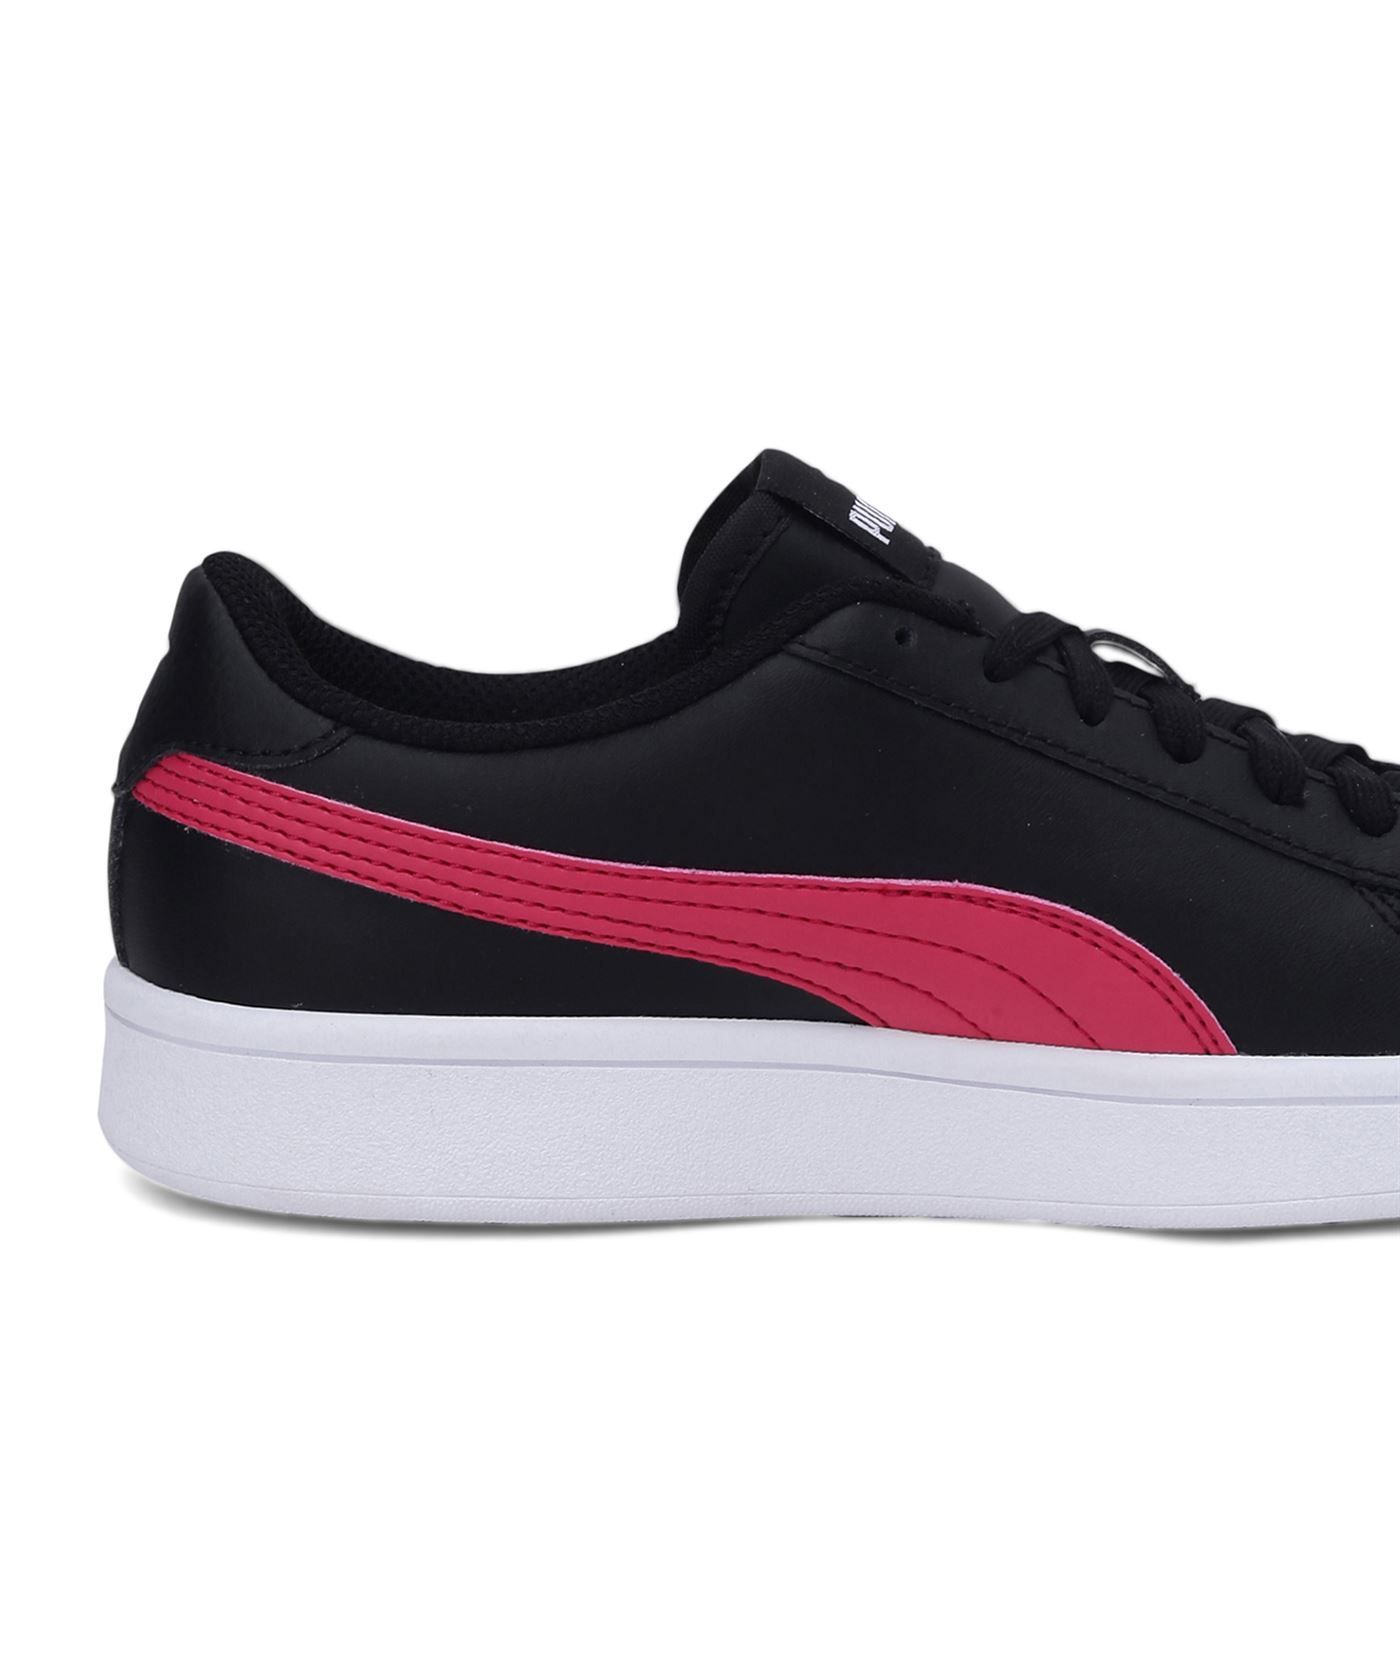 Puma Unisex Black Casual Wear Sneakers for Kids